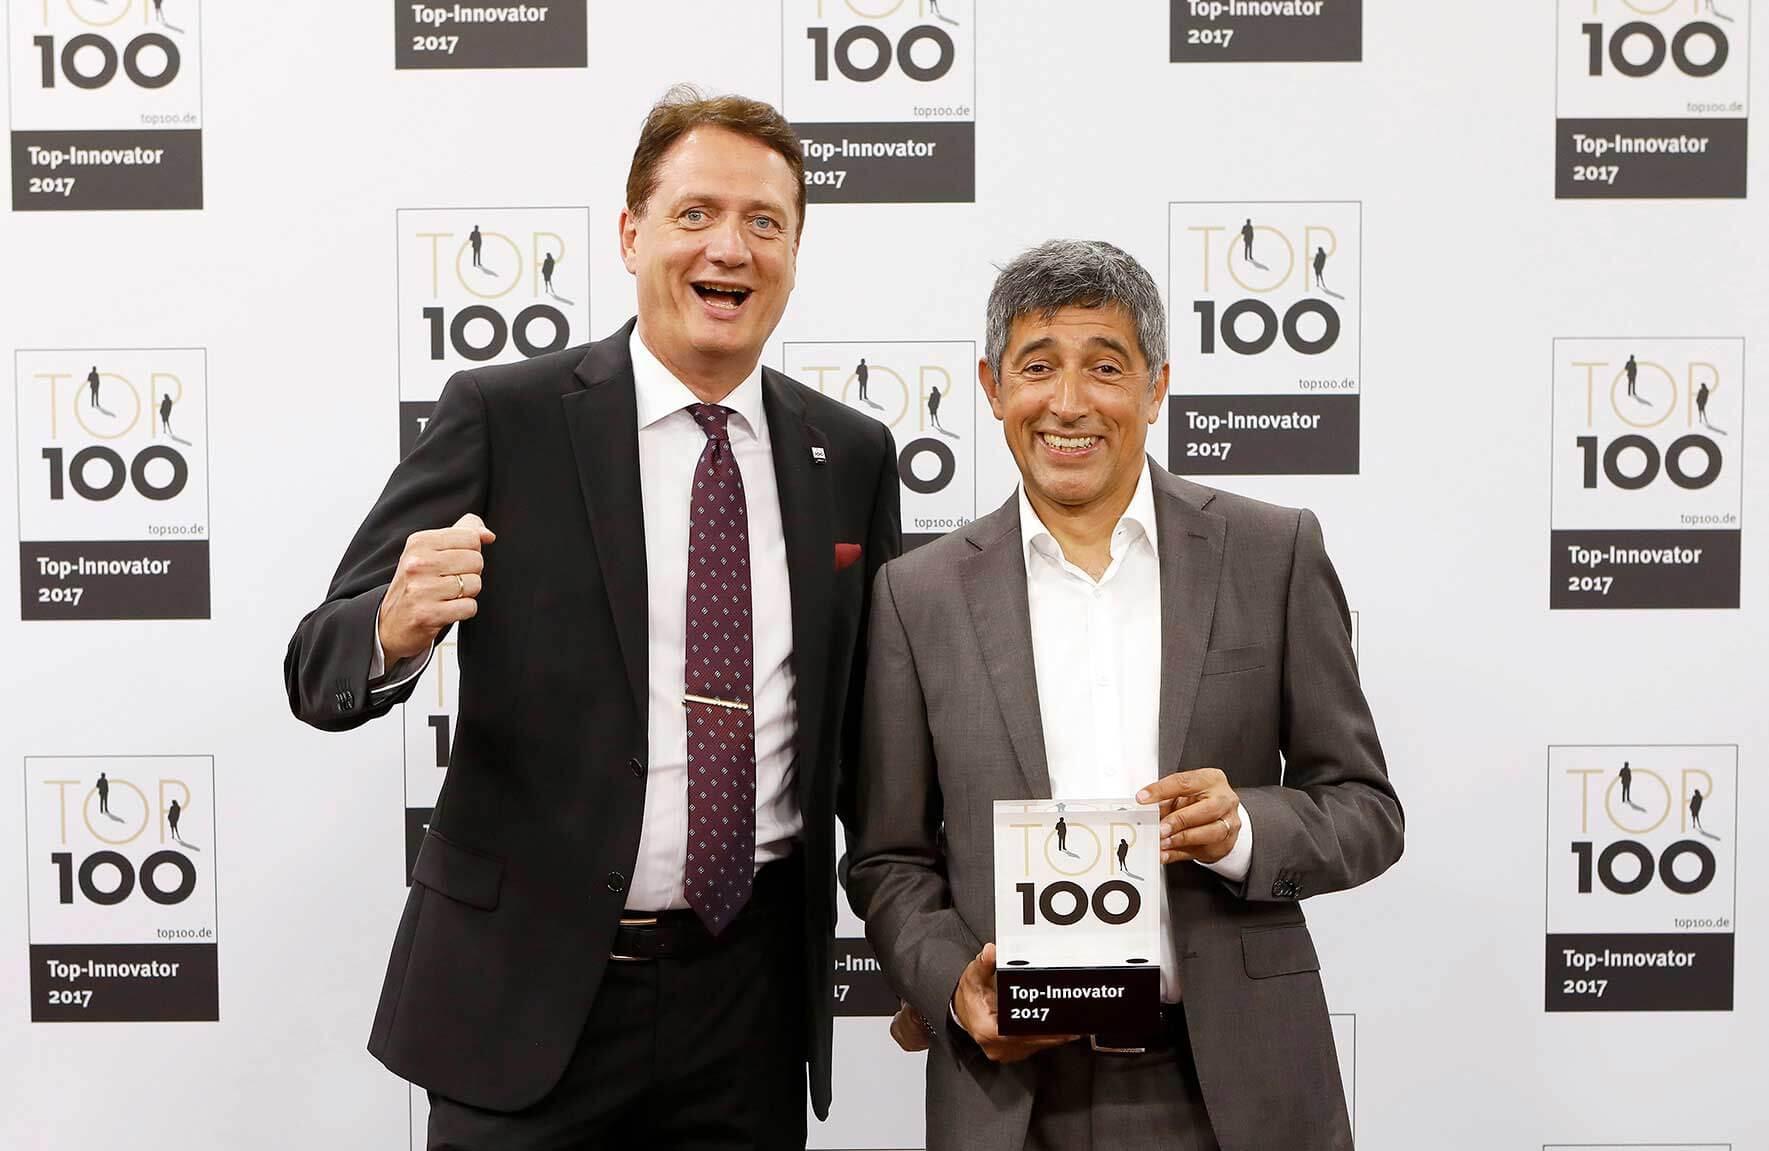 Ralf Geishauser mit Ranga Yogeshwar bei der Top 100-Preisverleihungleihg